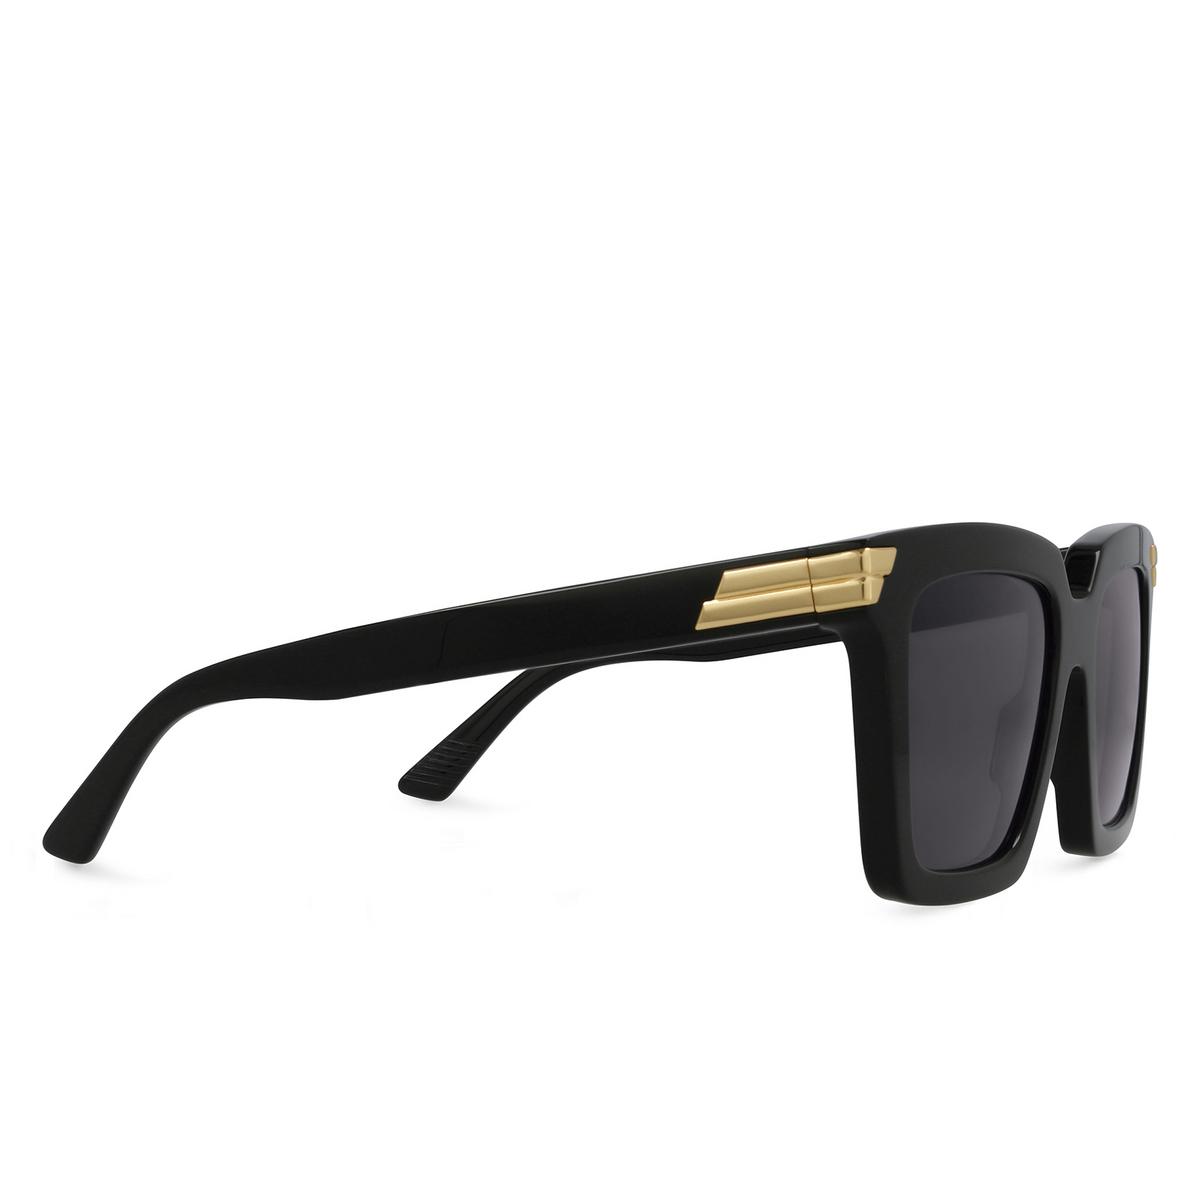 Bottega Veneta® Square Sunglasses: BV1005S color Black 001 - three-quarters view.